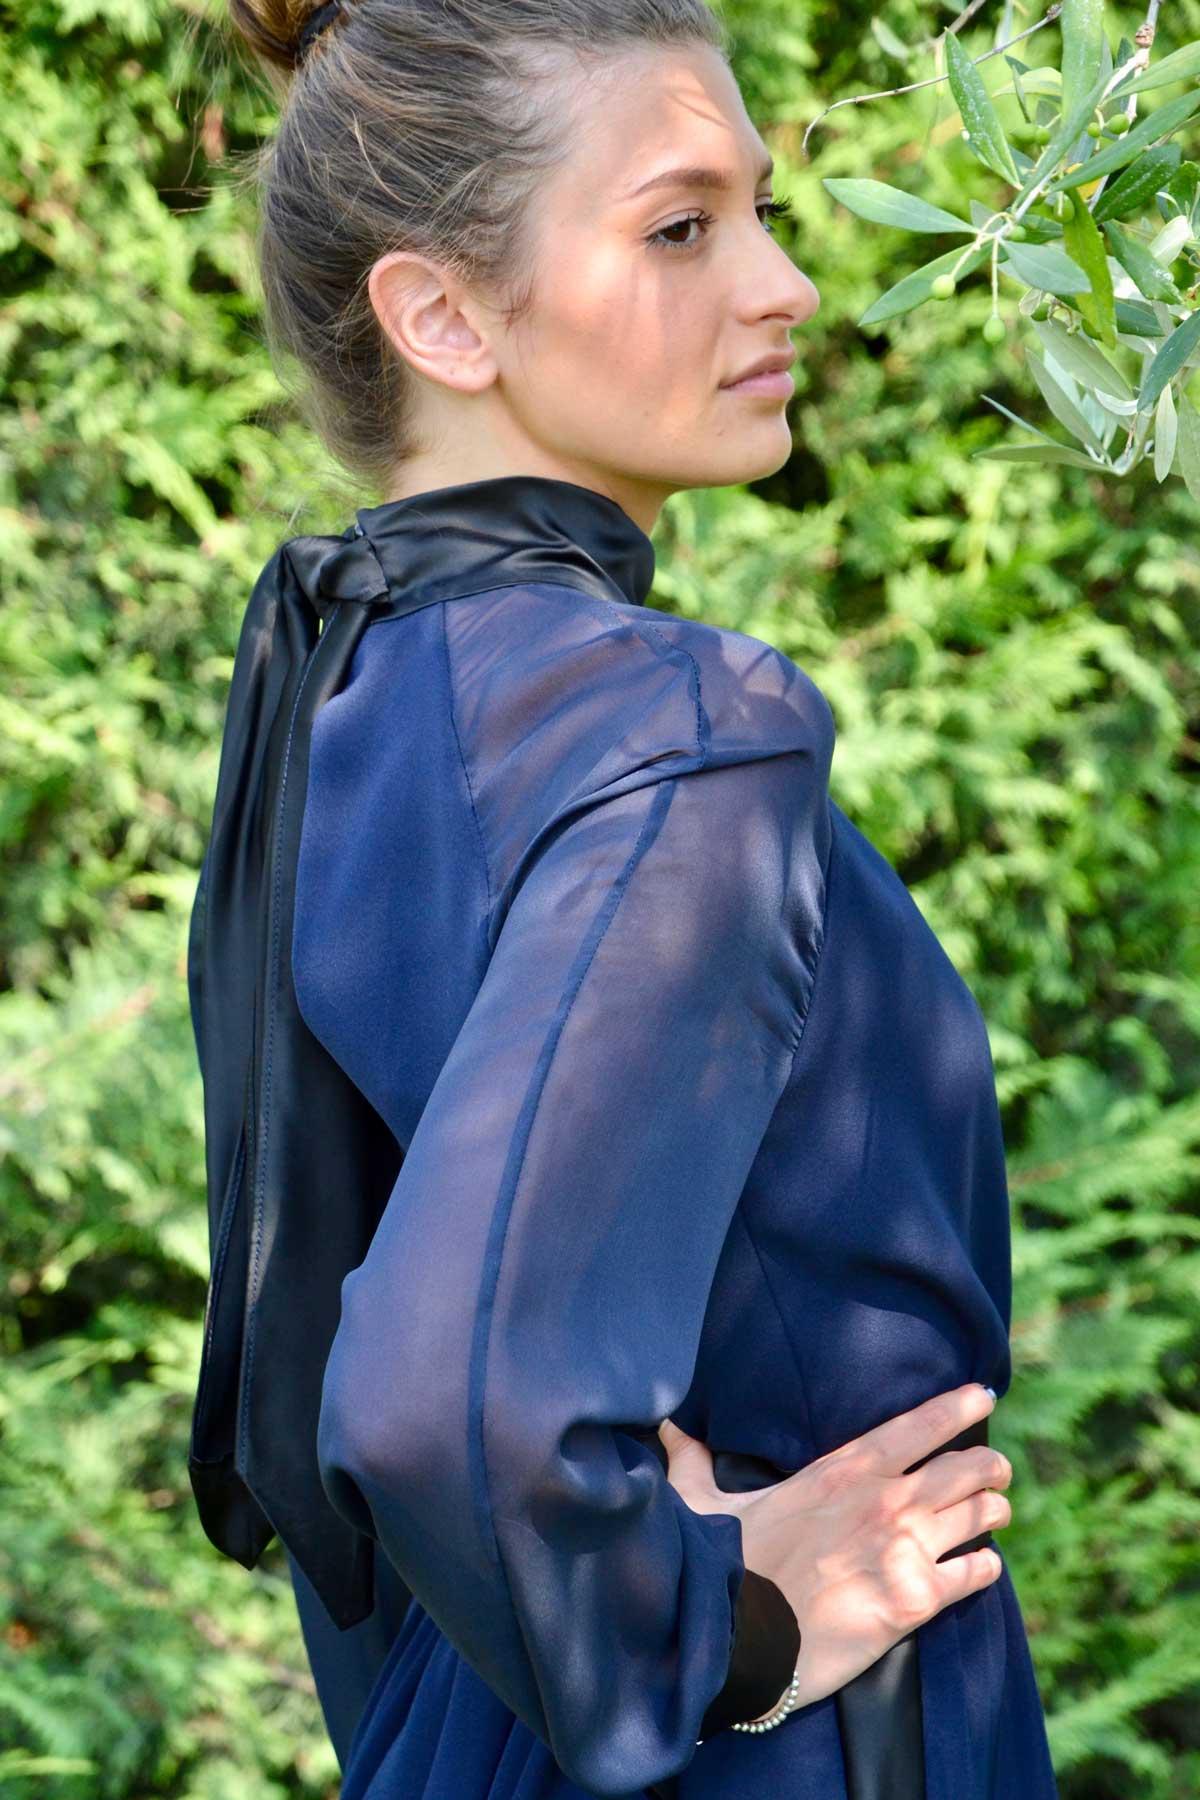 matteo-perin-women-clothing-dress-012.jpg